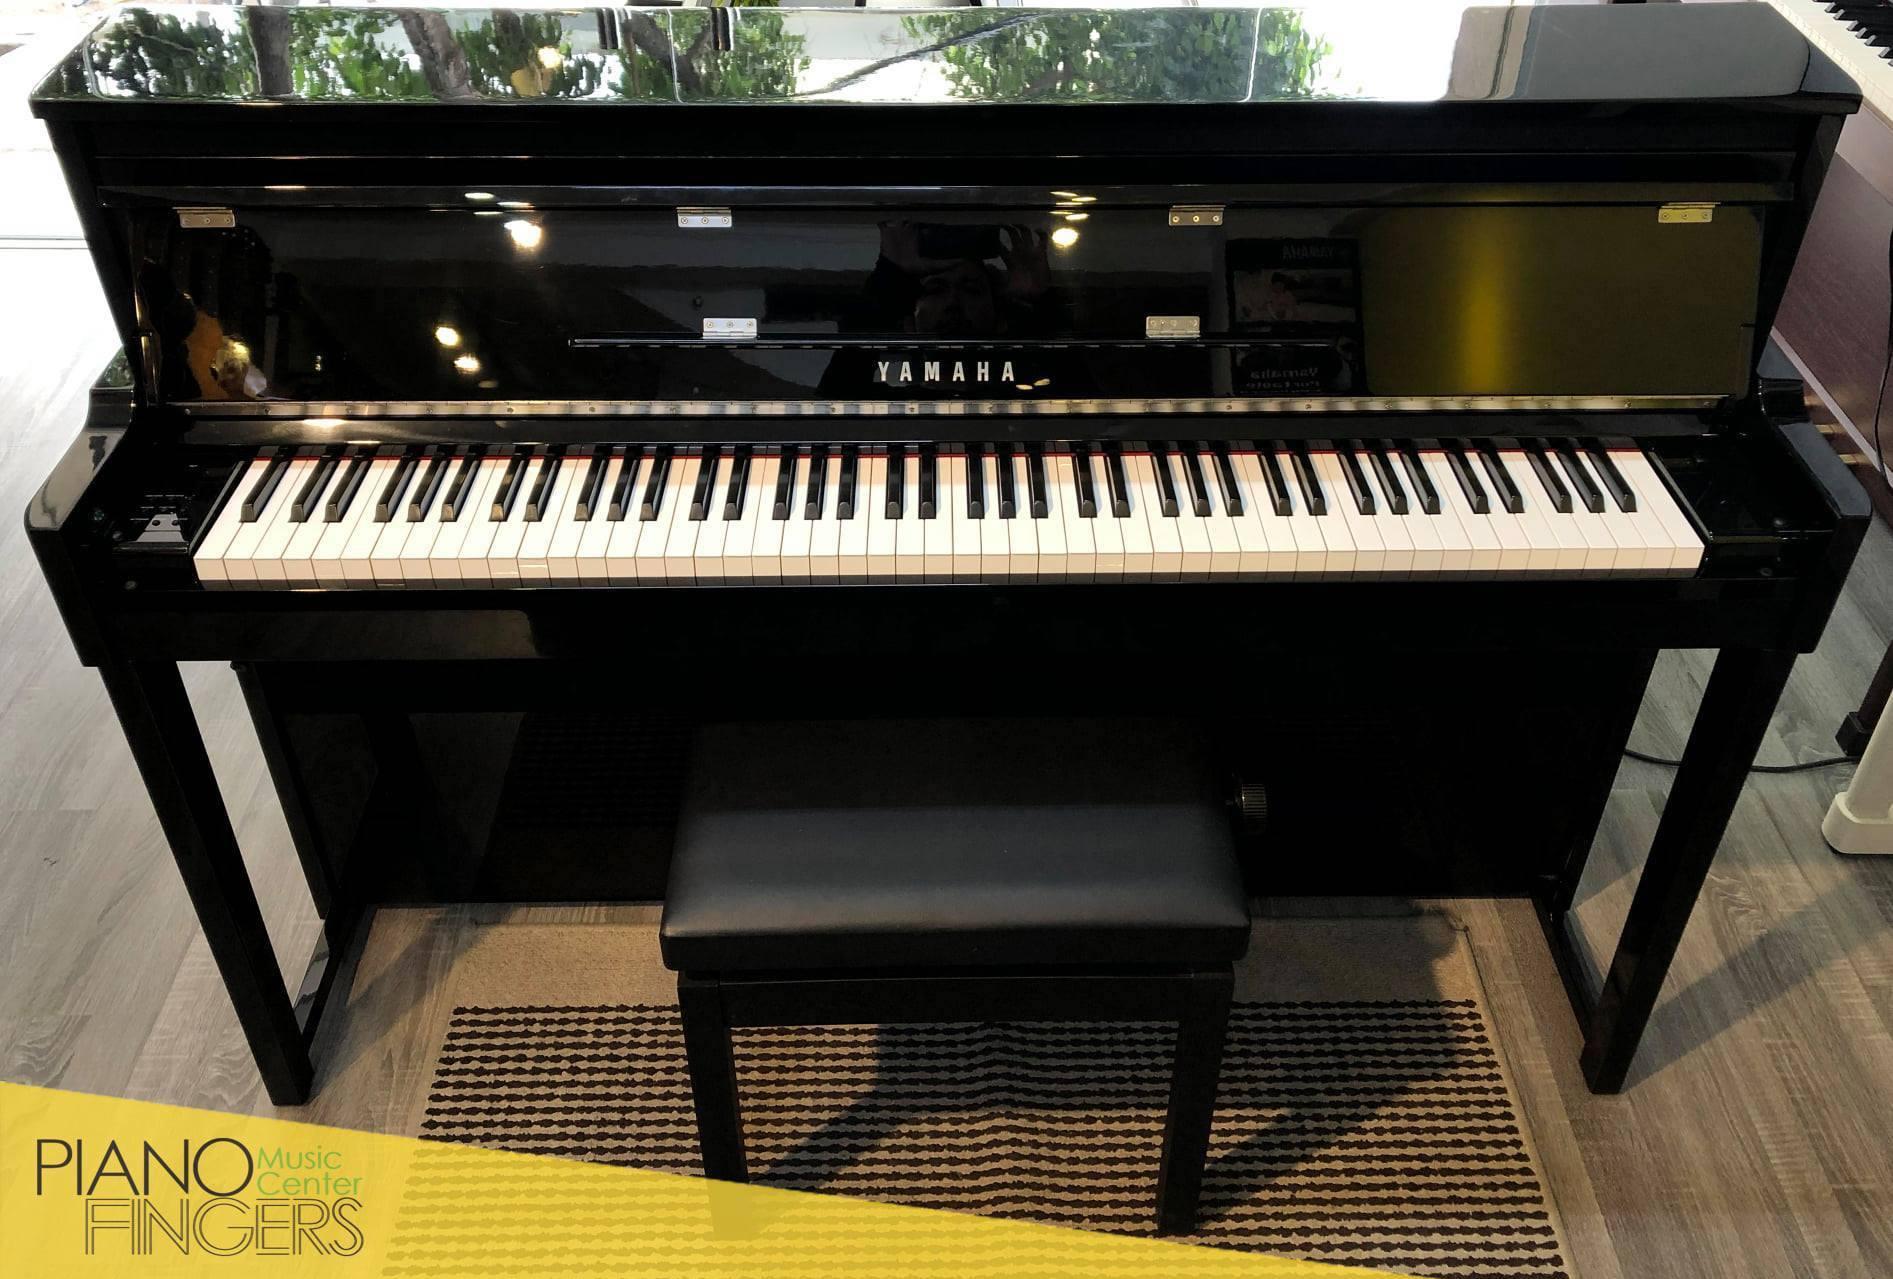 bang-gia-top-10-piano-co-dang-mua-nhat-nam-2021-yamaha-nu1